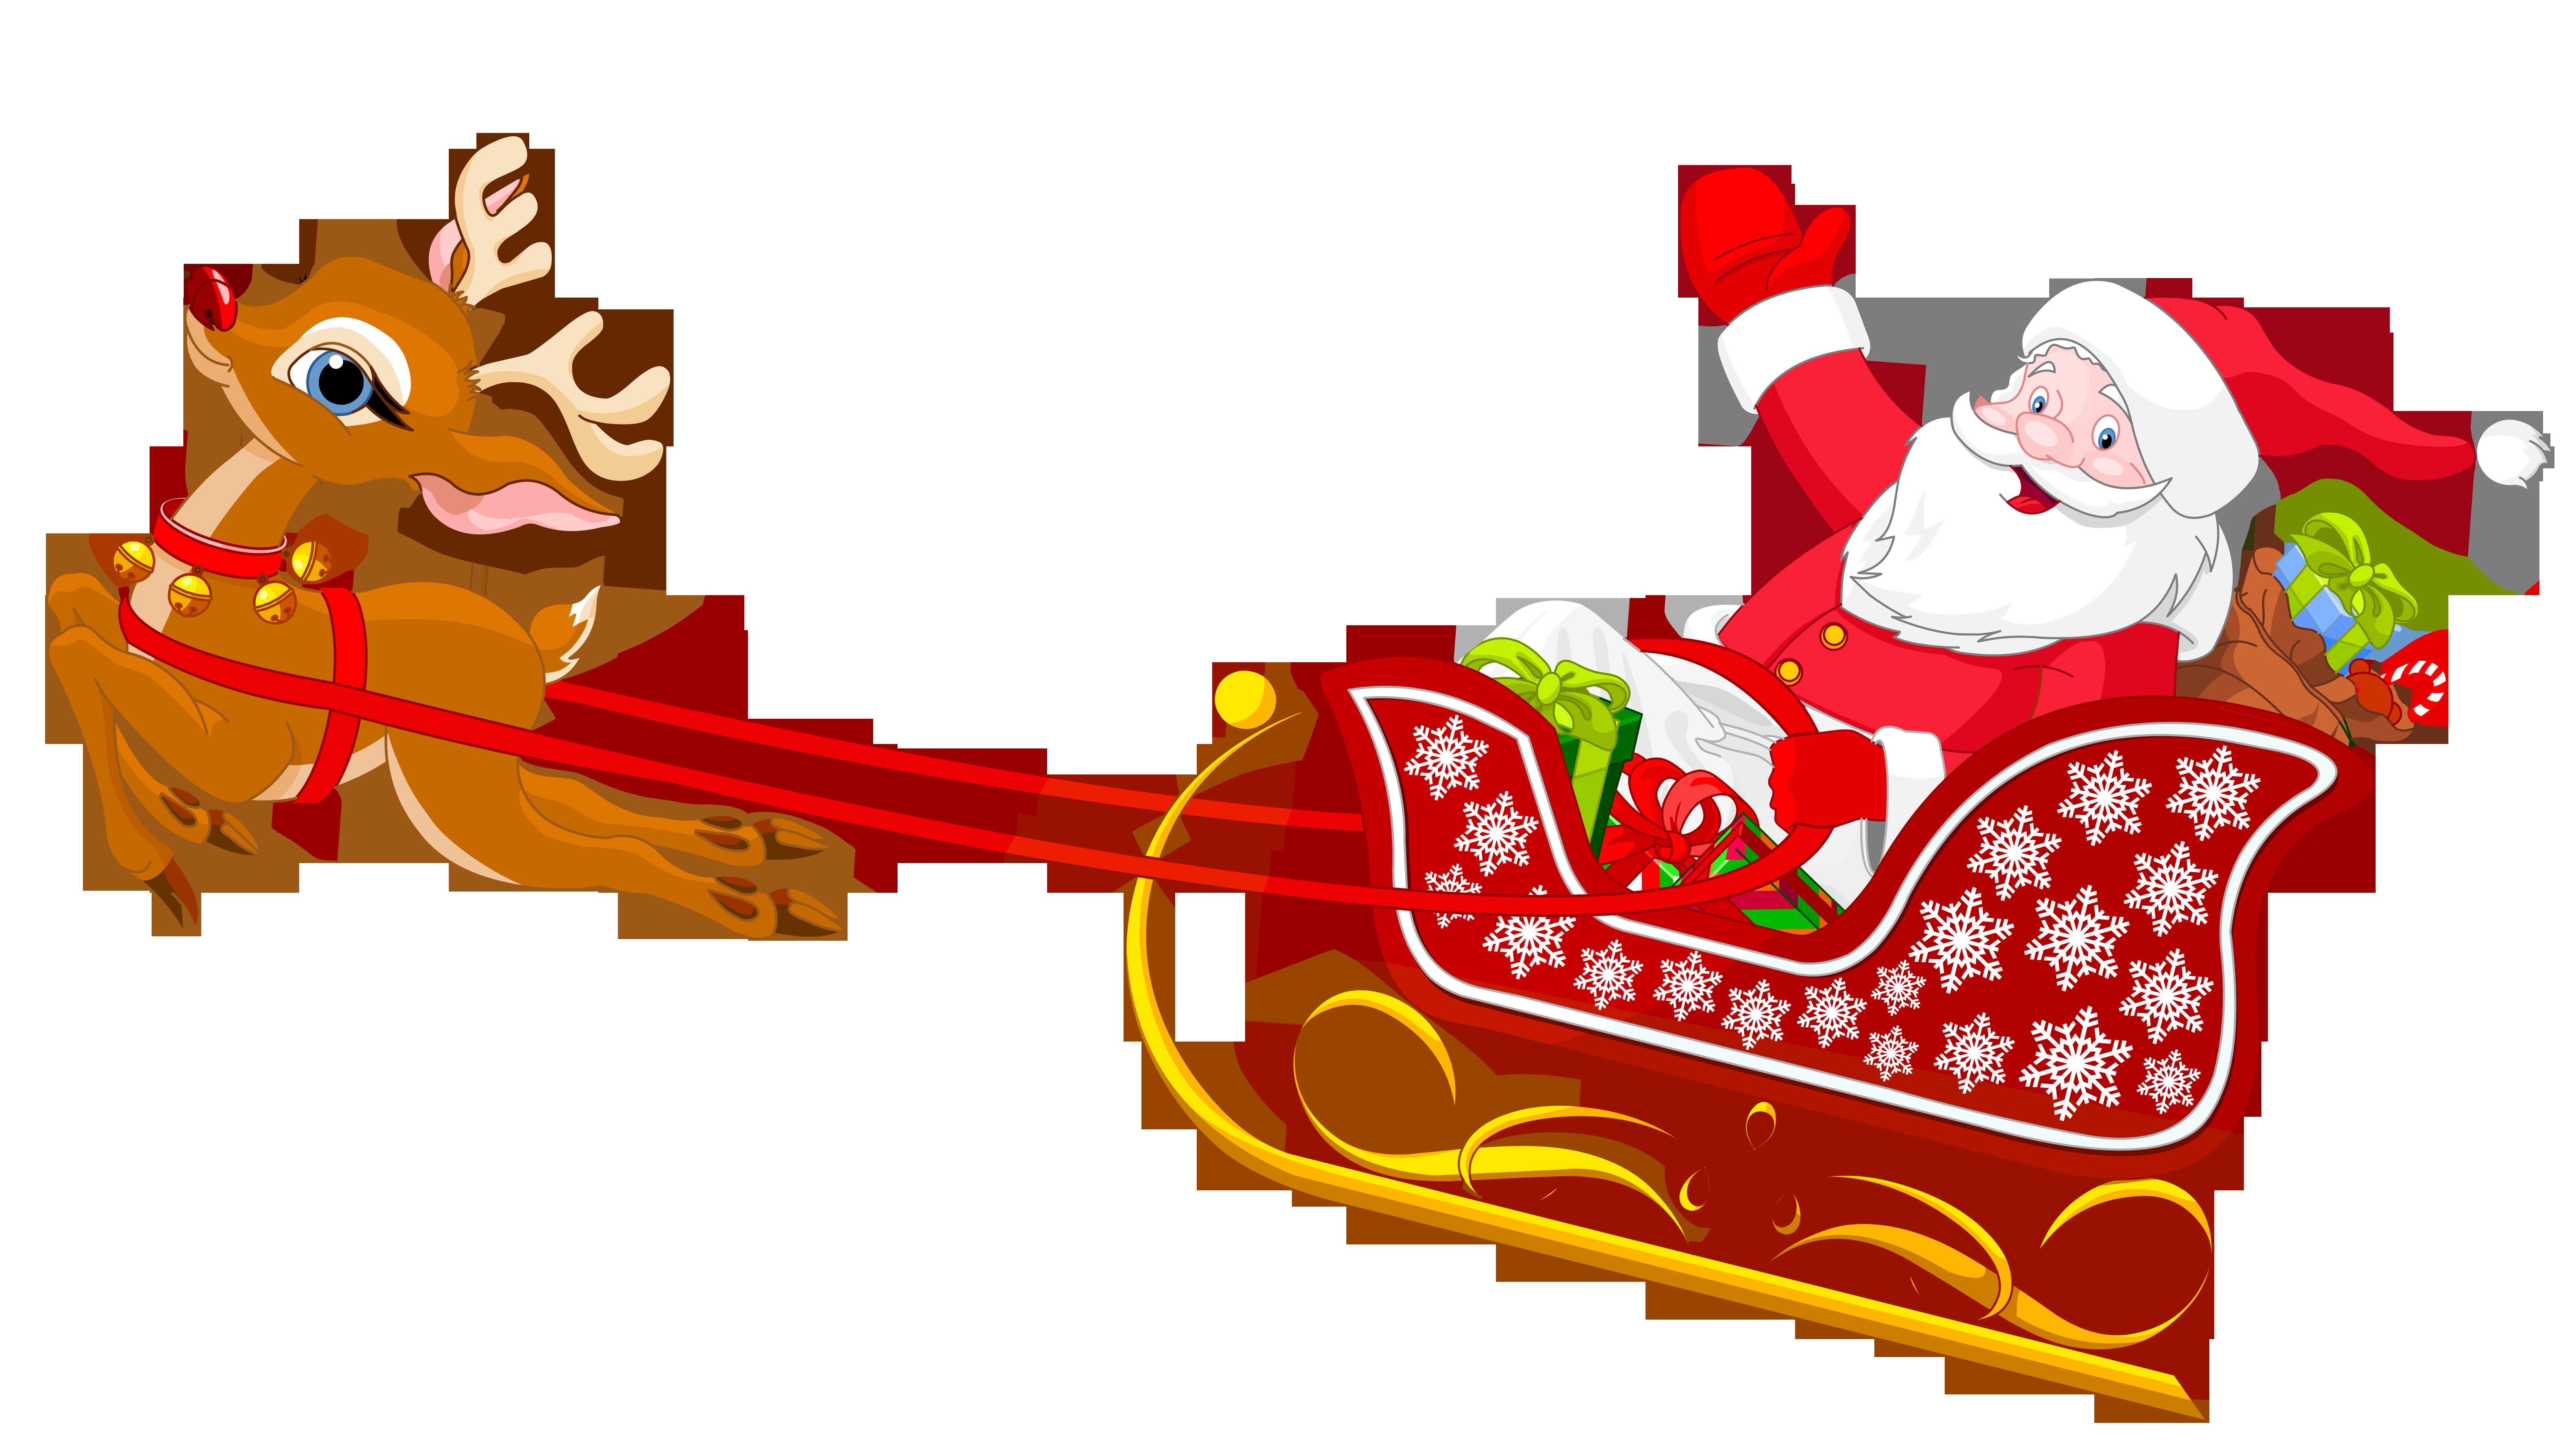 Christmas Reindeer Png.Christmas Reindeer Clipart At Getdrawings Com Free For